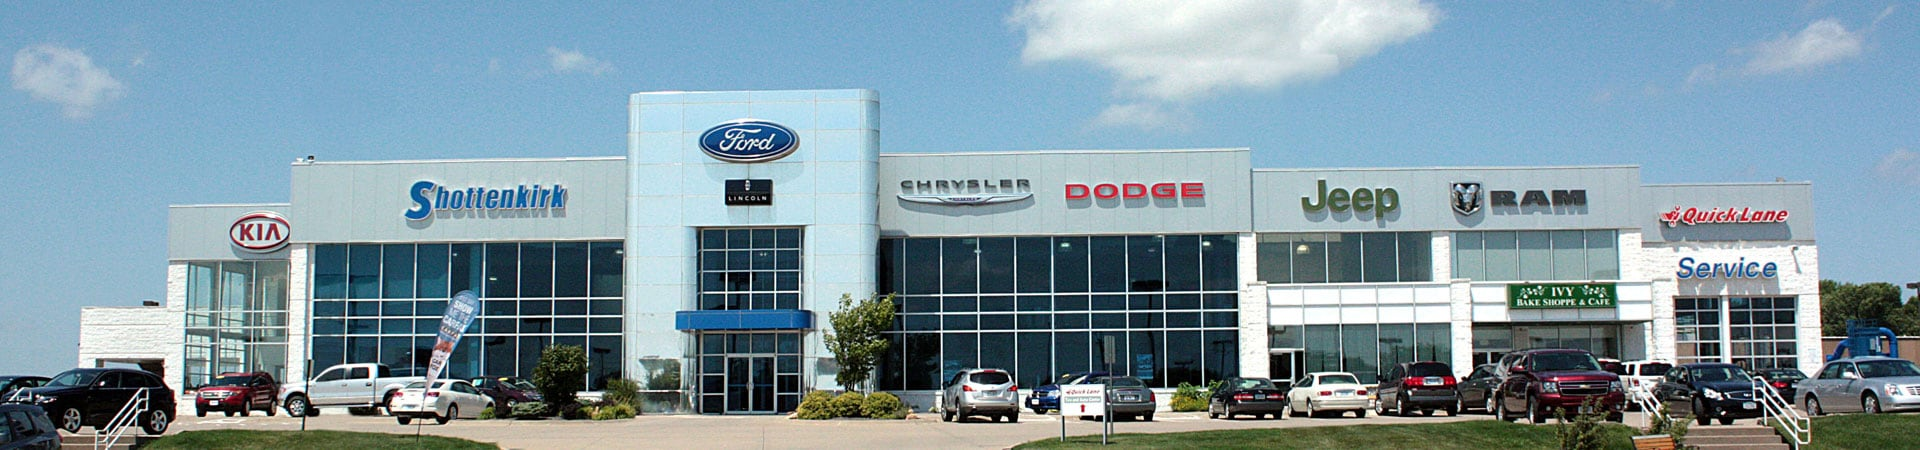 Shottenkirk Chrysler Dodge Jeep Ram | New Jeep, Chrysler ...